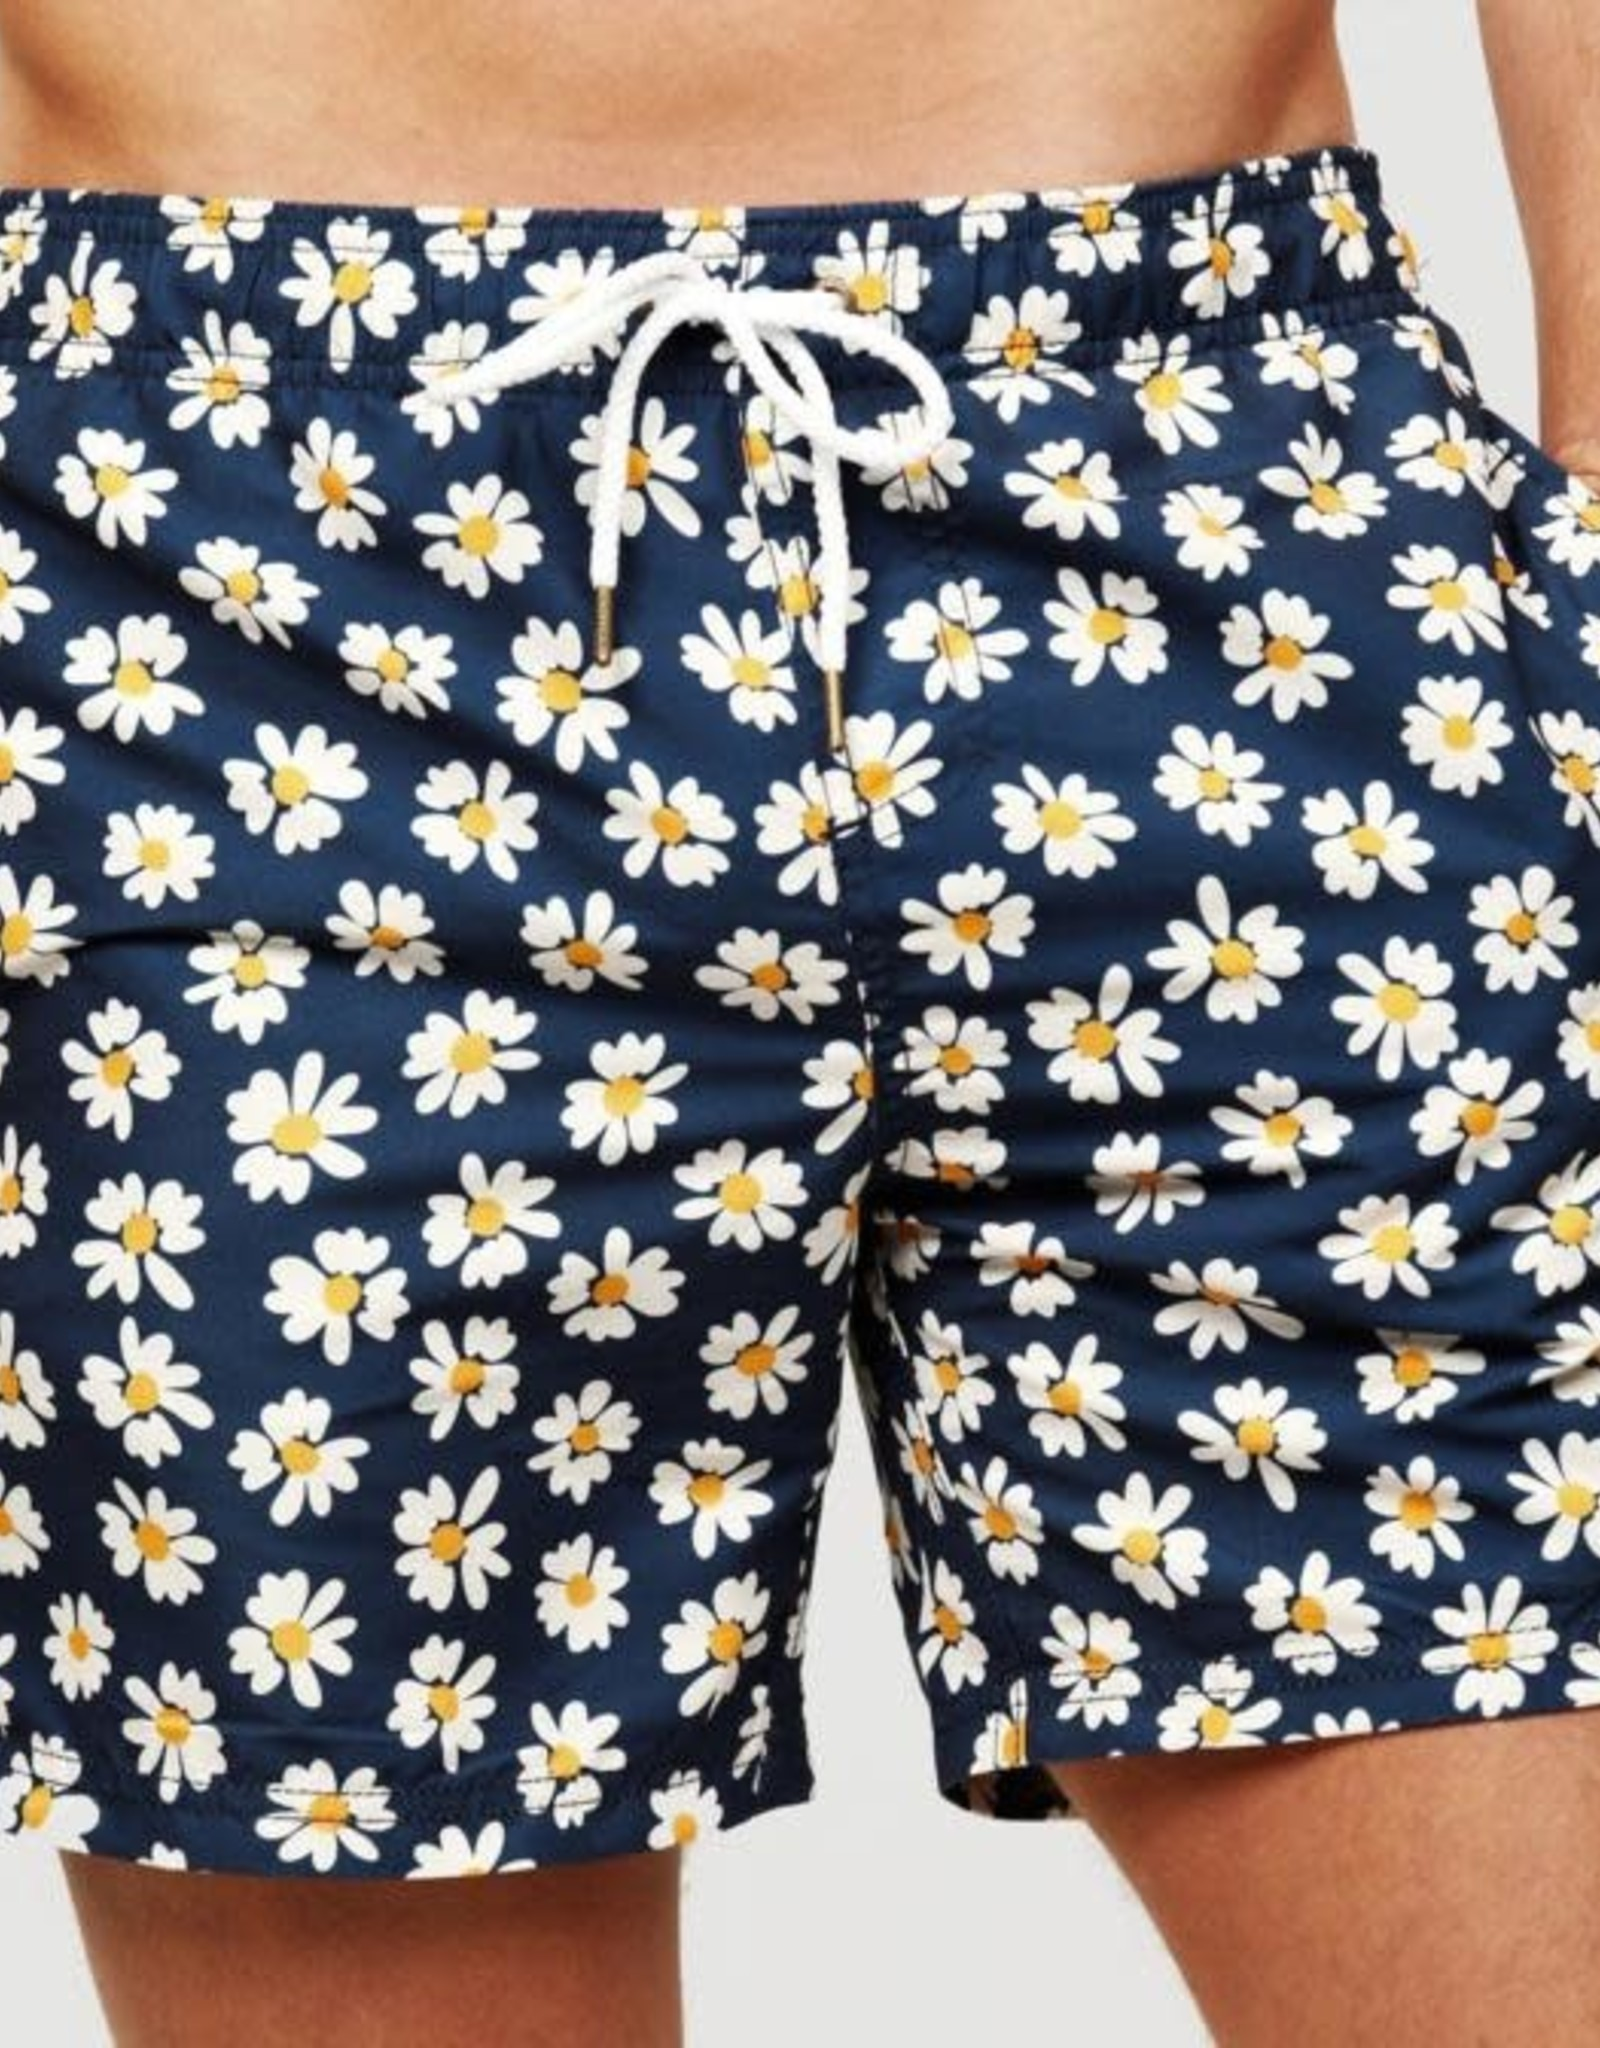 ORTC Cottesloe Swim Short